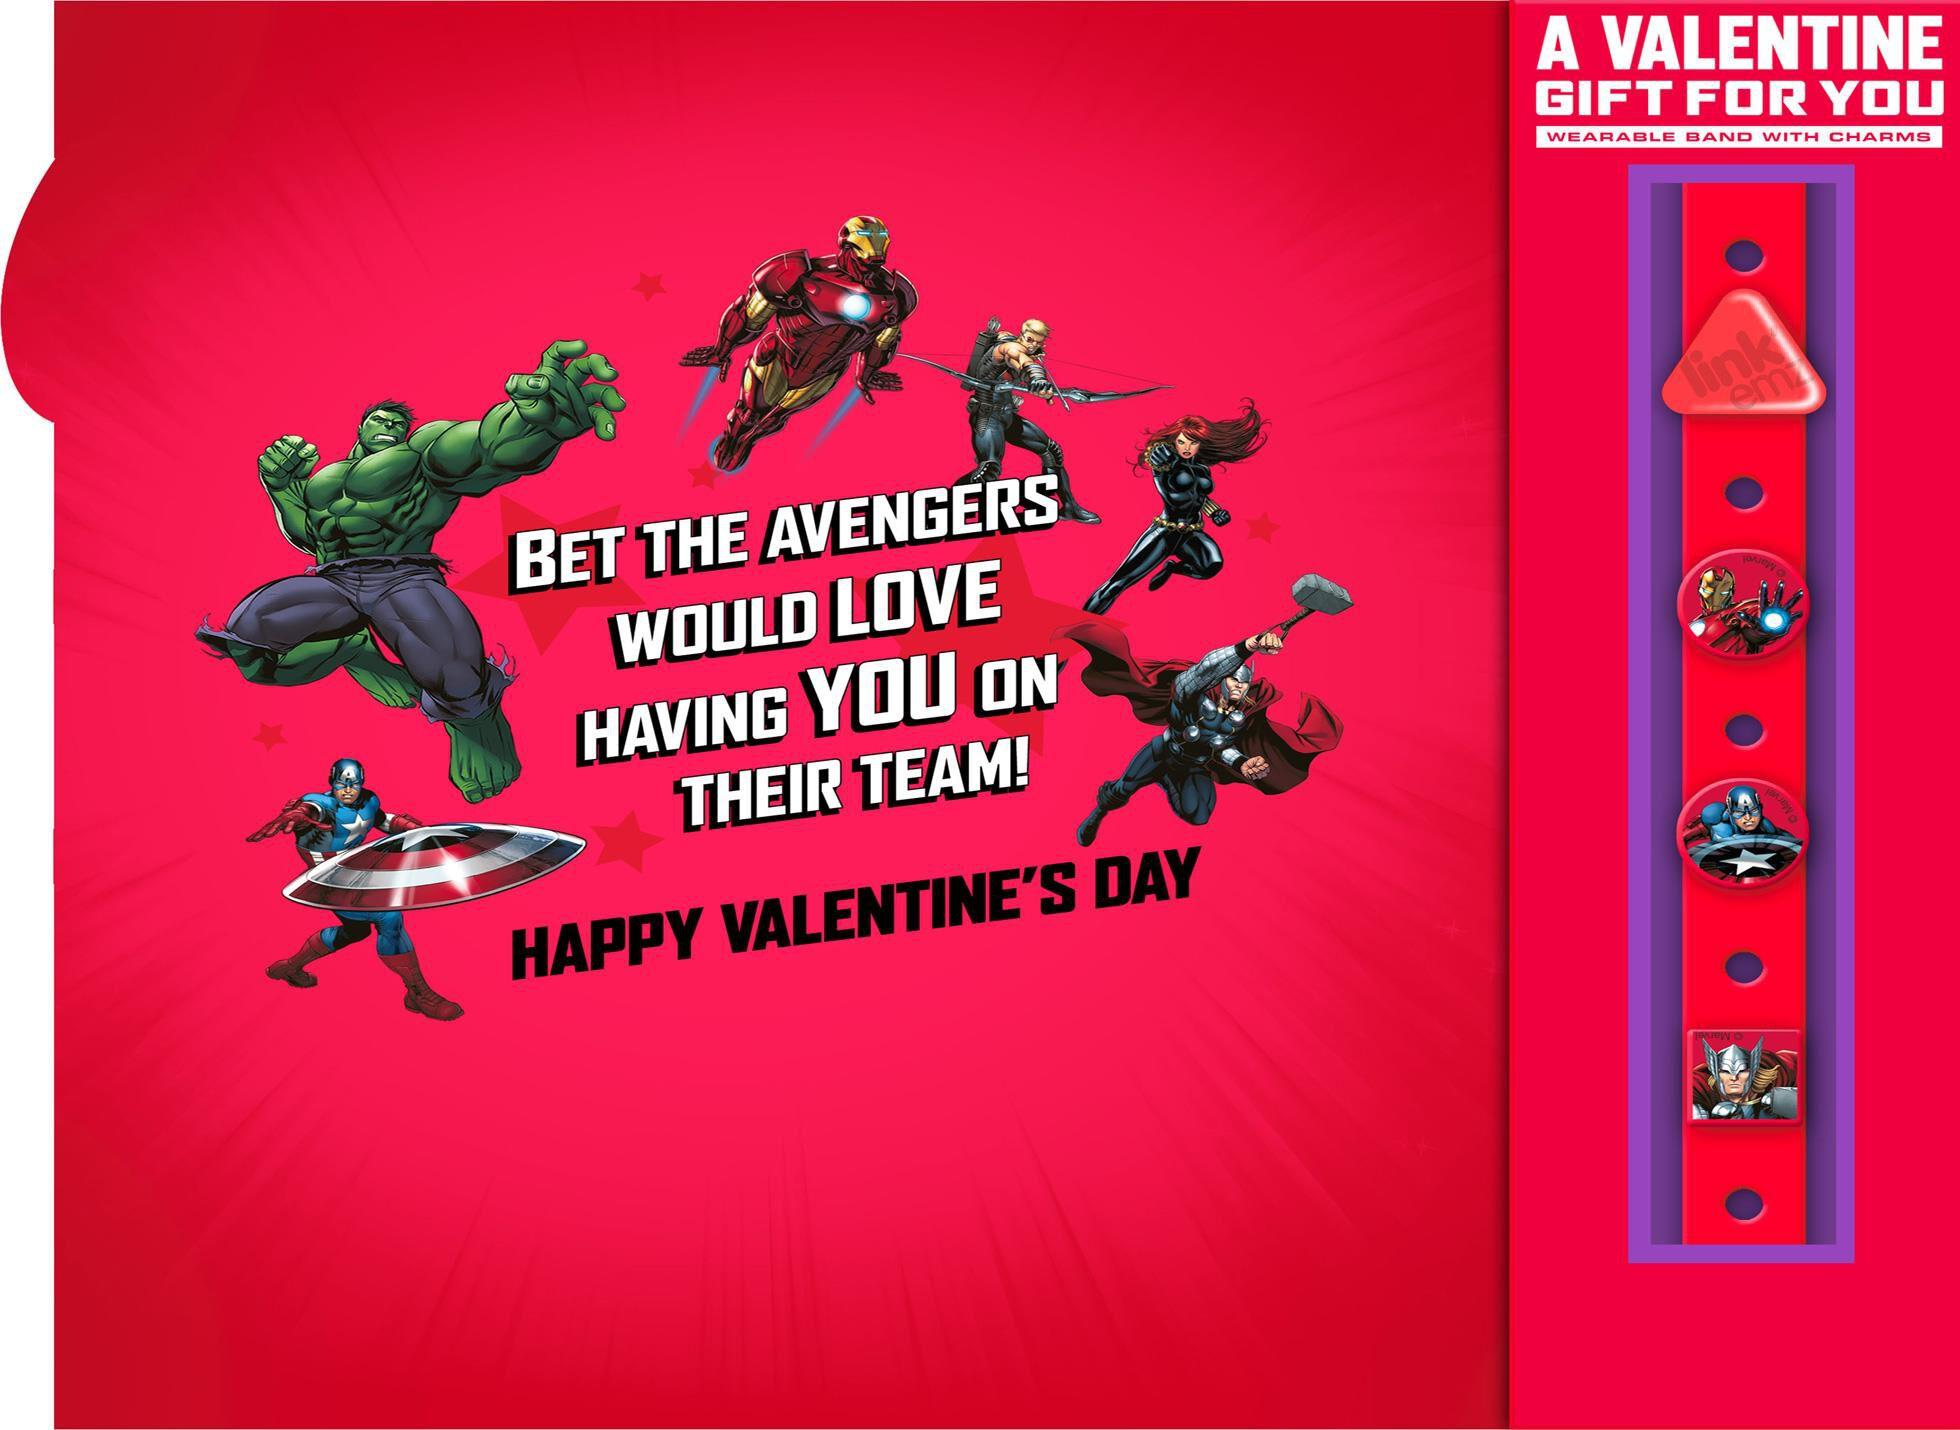 Marvel Avengers Valentineu0027s Day Card With Linku0027emz Wristband,